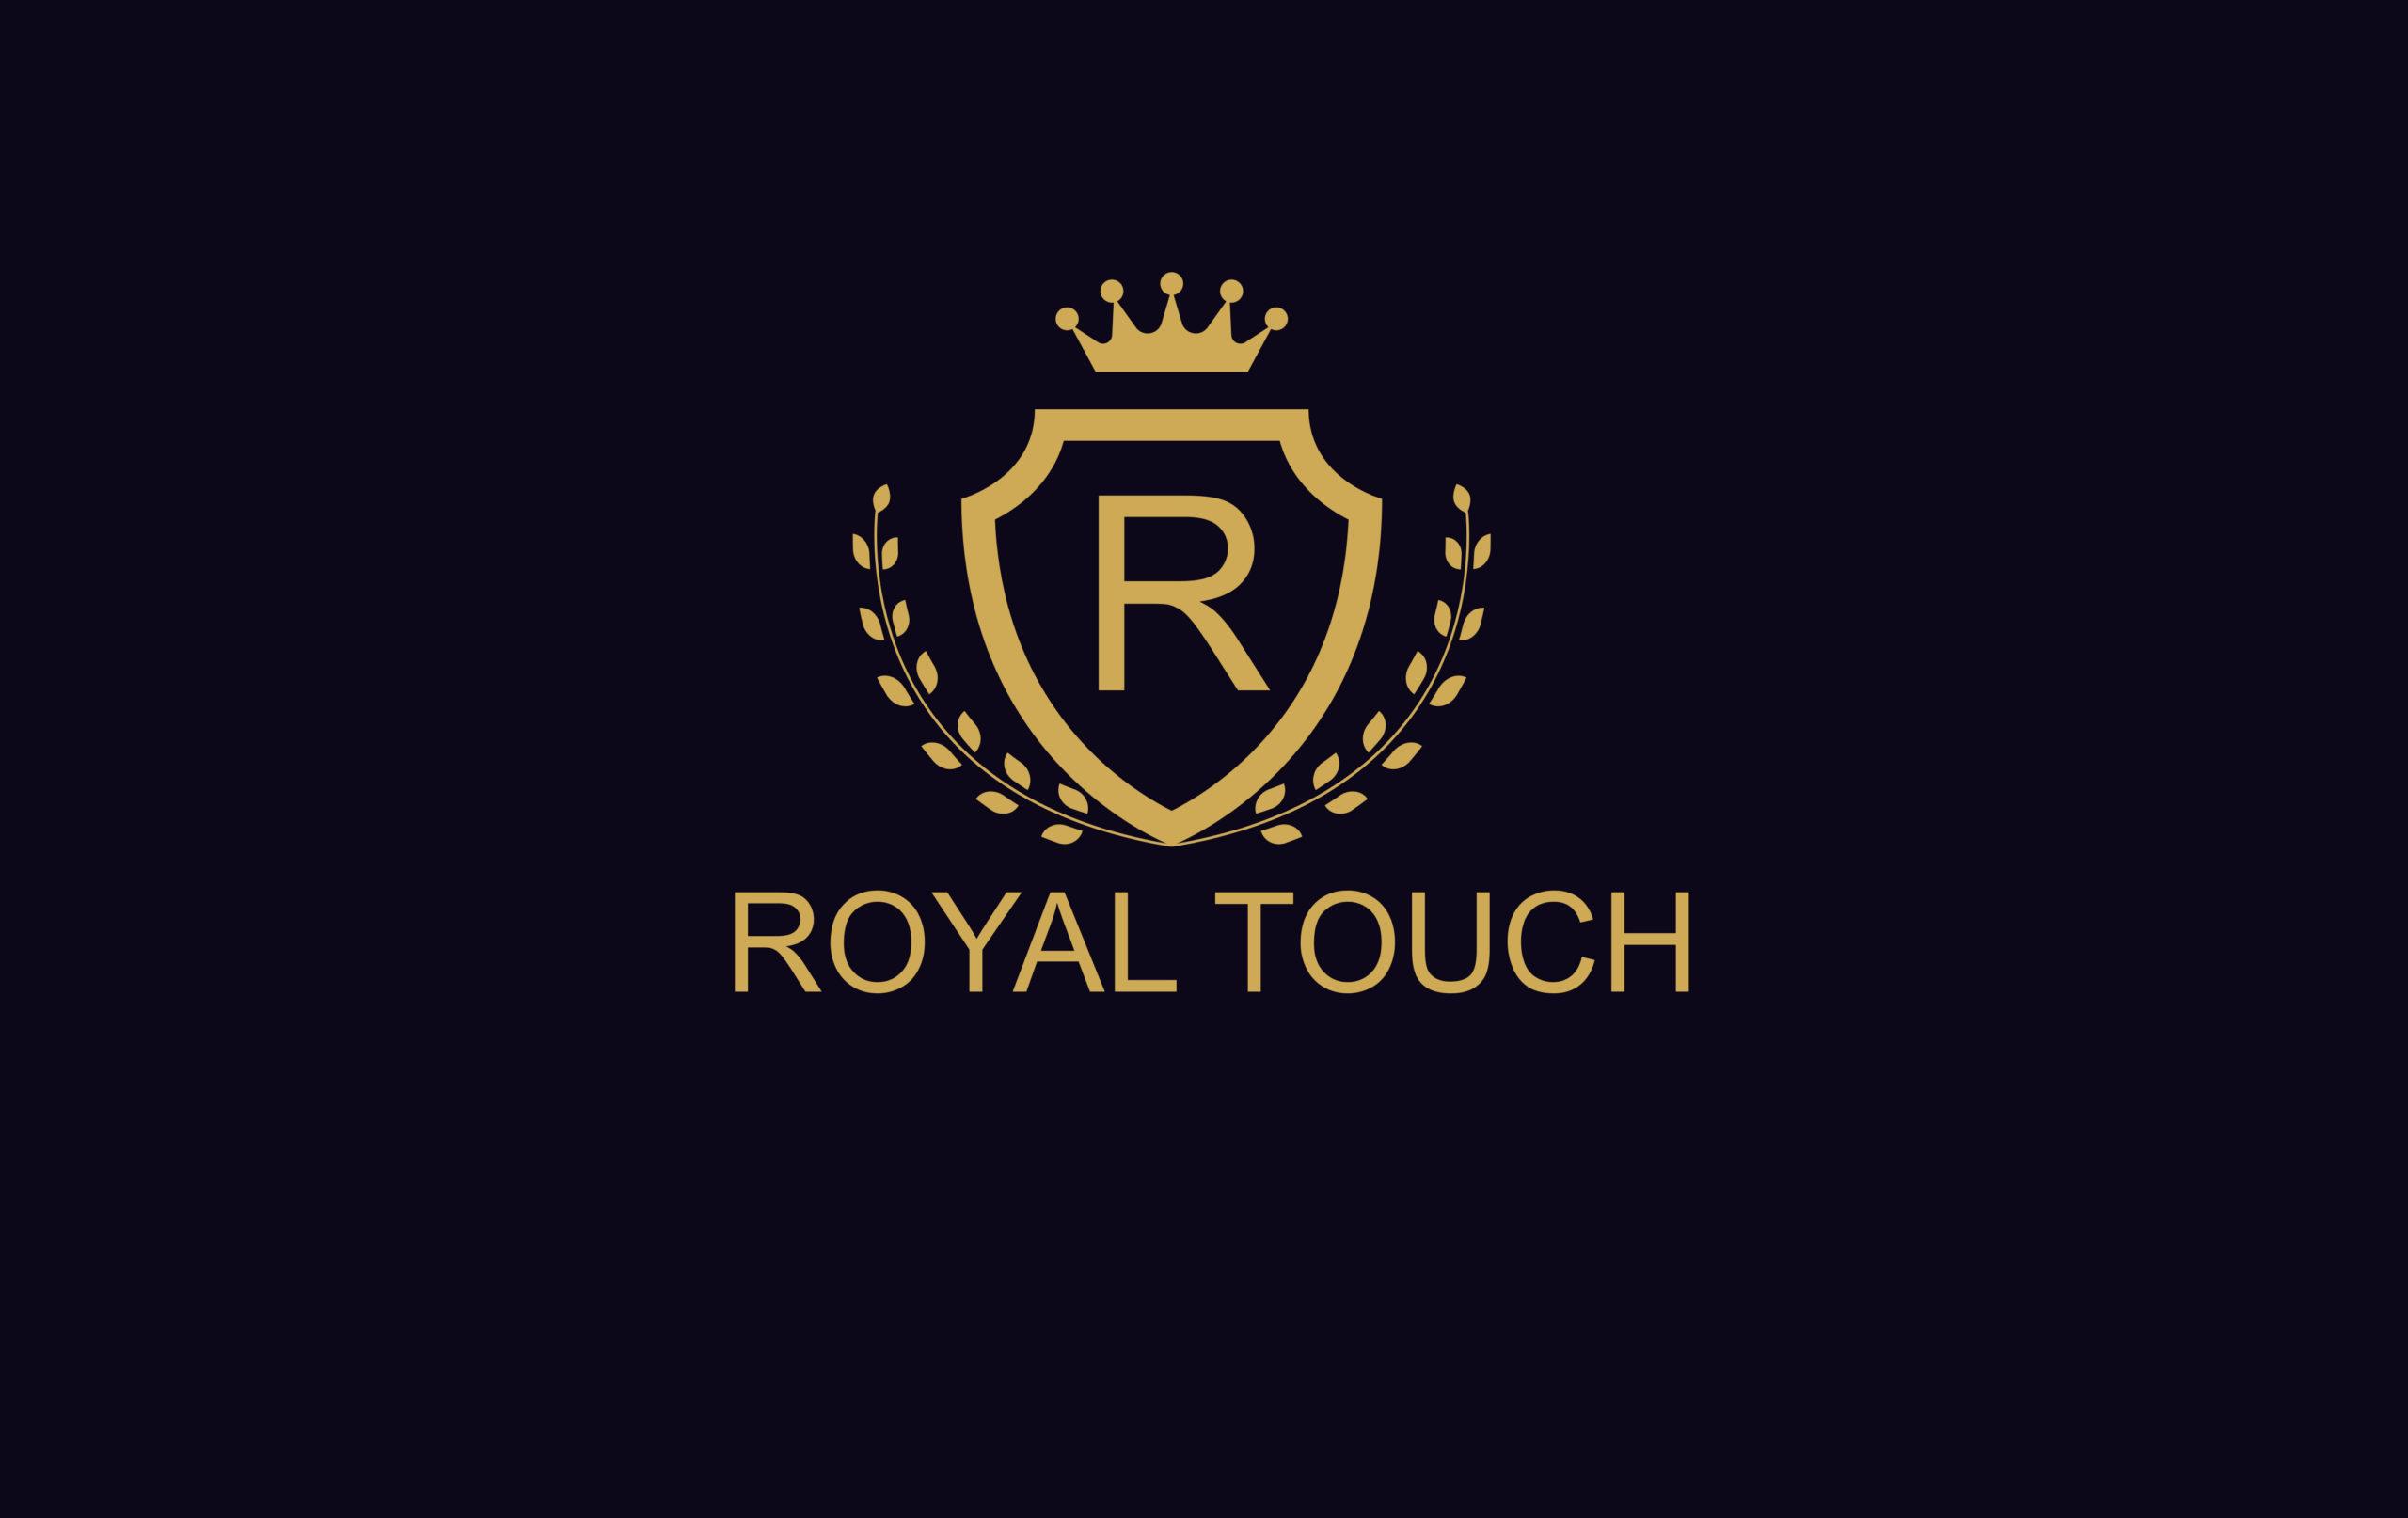 Royal Touch garment shop logo design by Badri Design